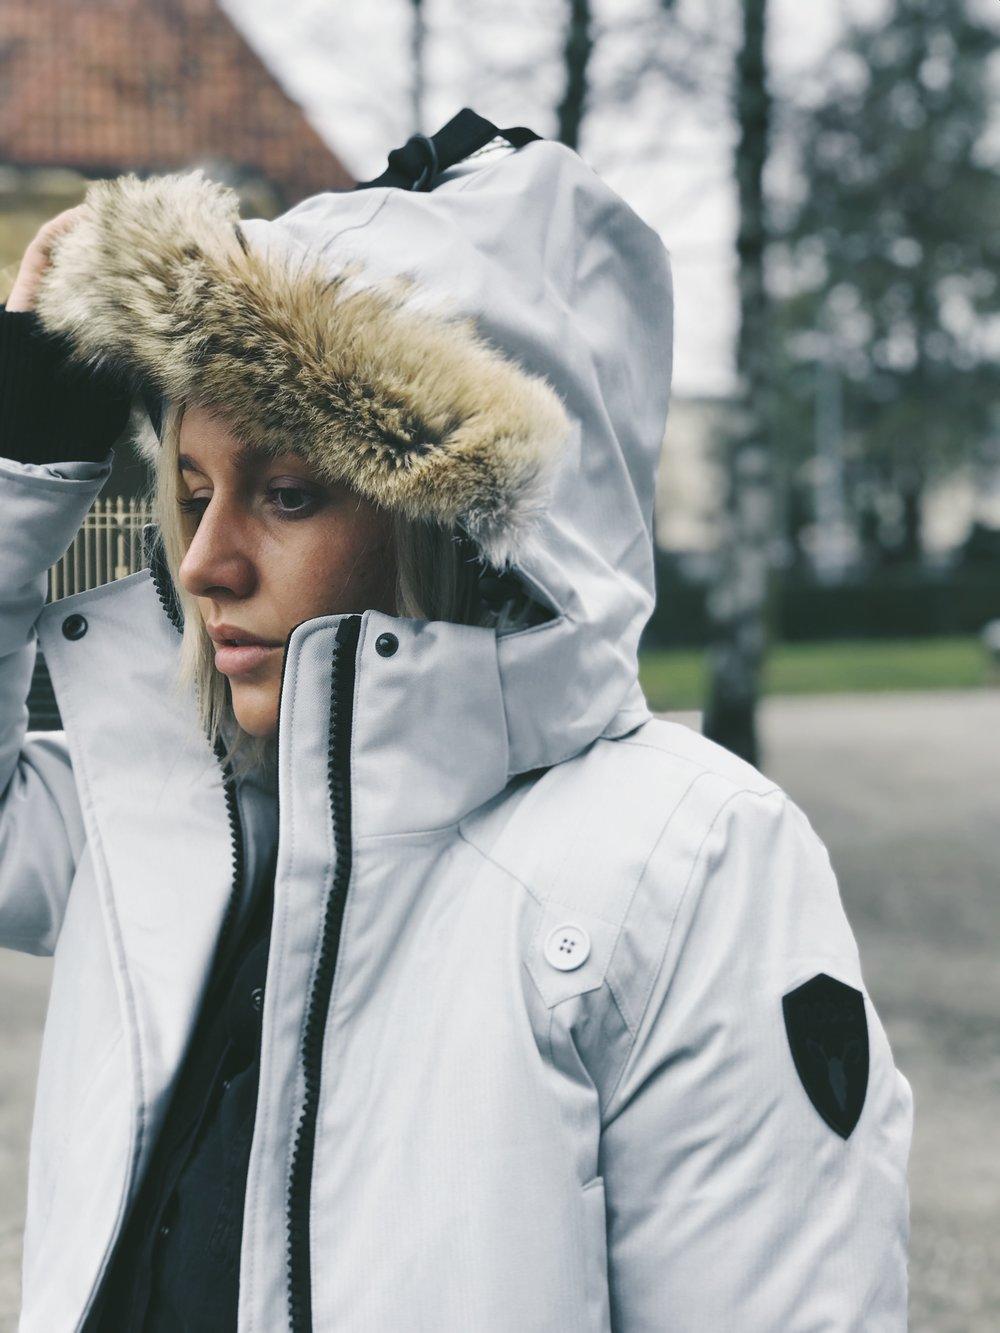 Canada - Meilleur ami du froid